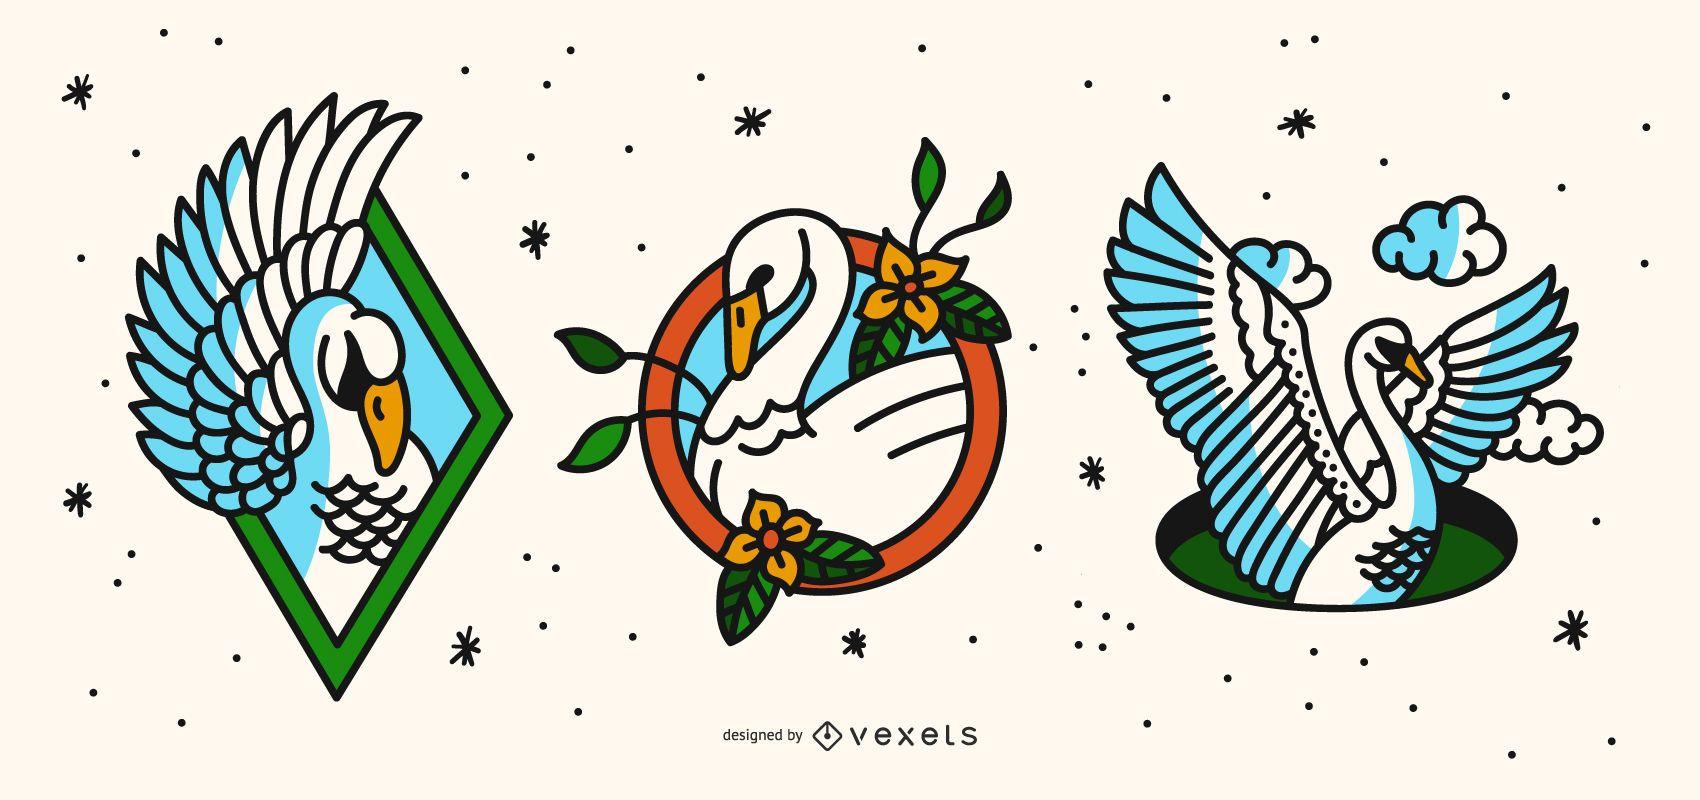 Swan Old School Tattoo Design Set